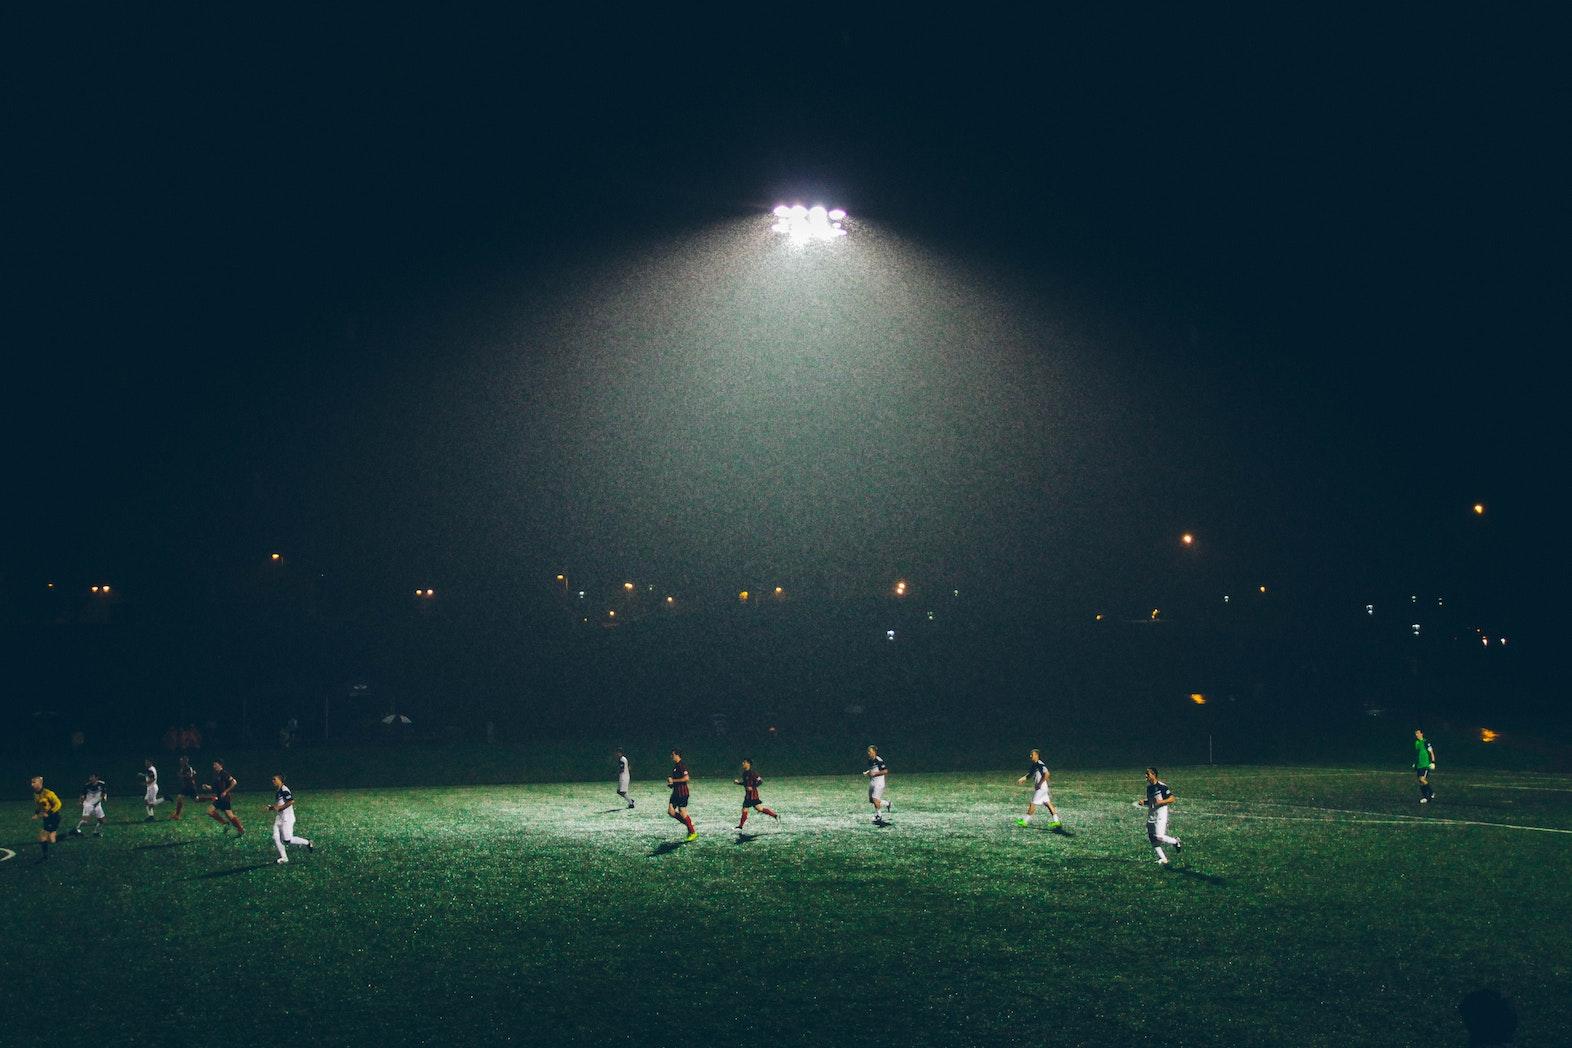 10.04.2021, 14:00 Uhr: FC Wegberg-Beeck vs. Fortuna Düsseldorf U23